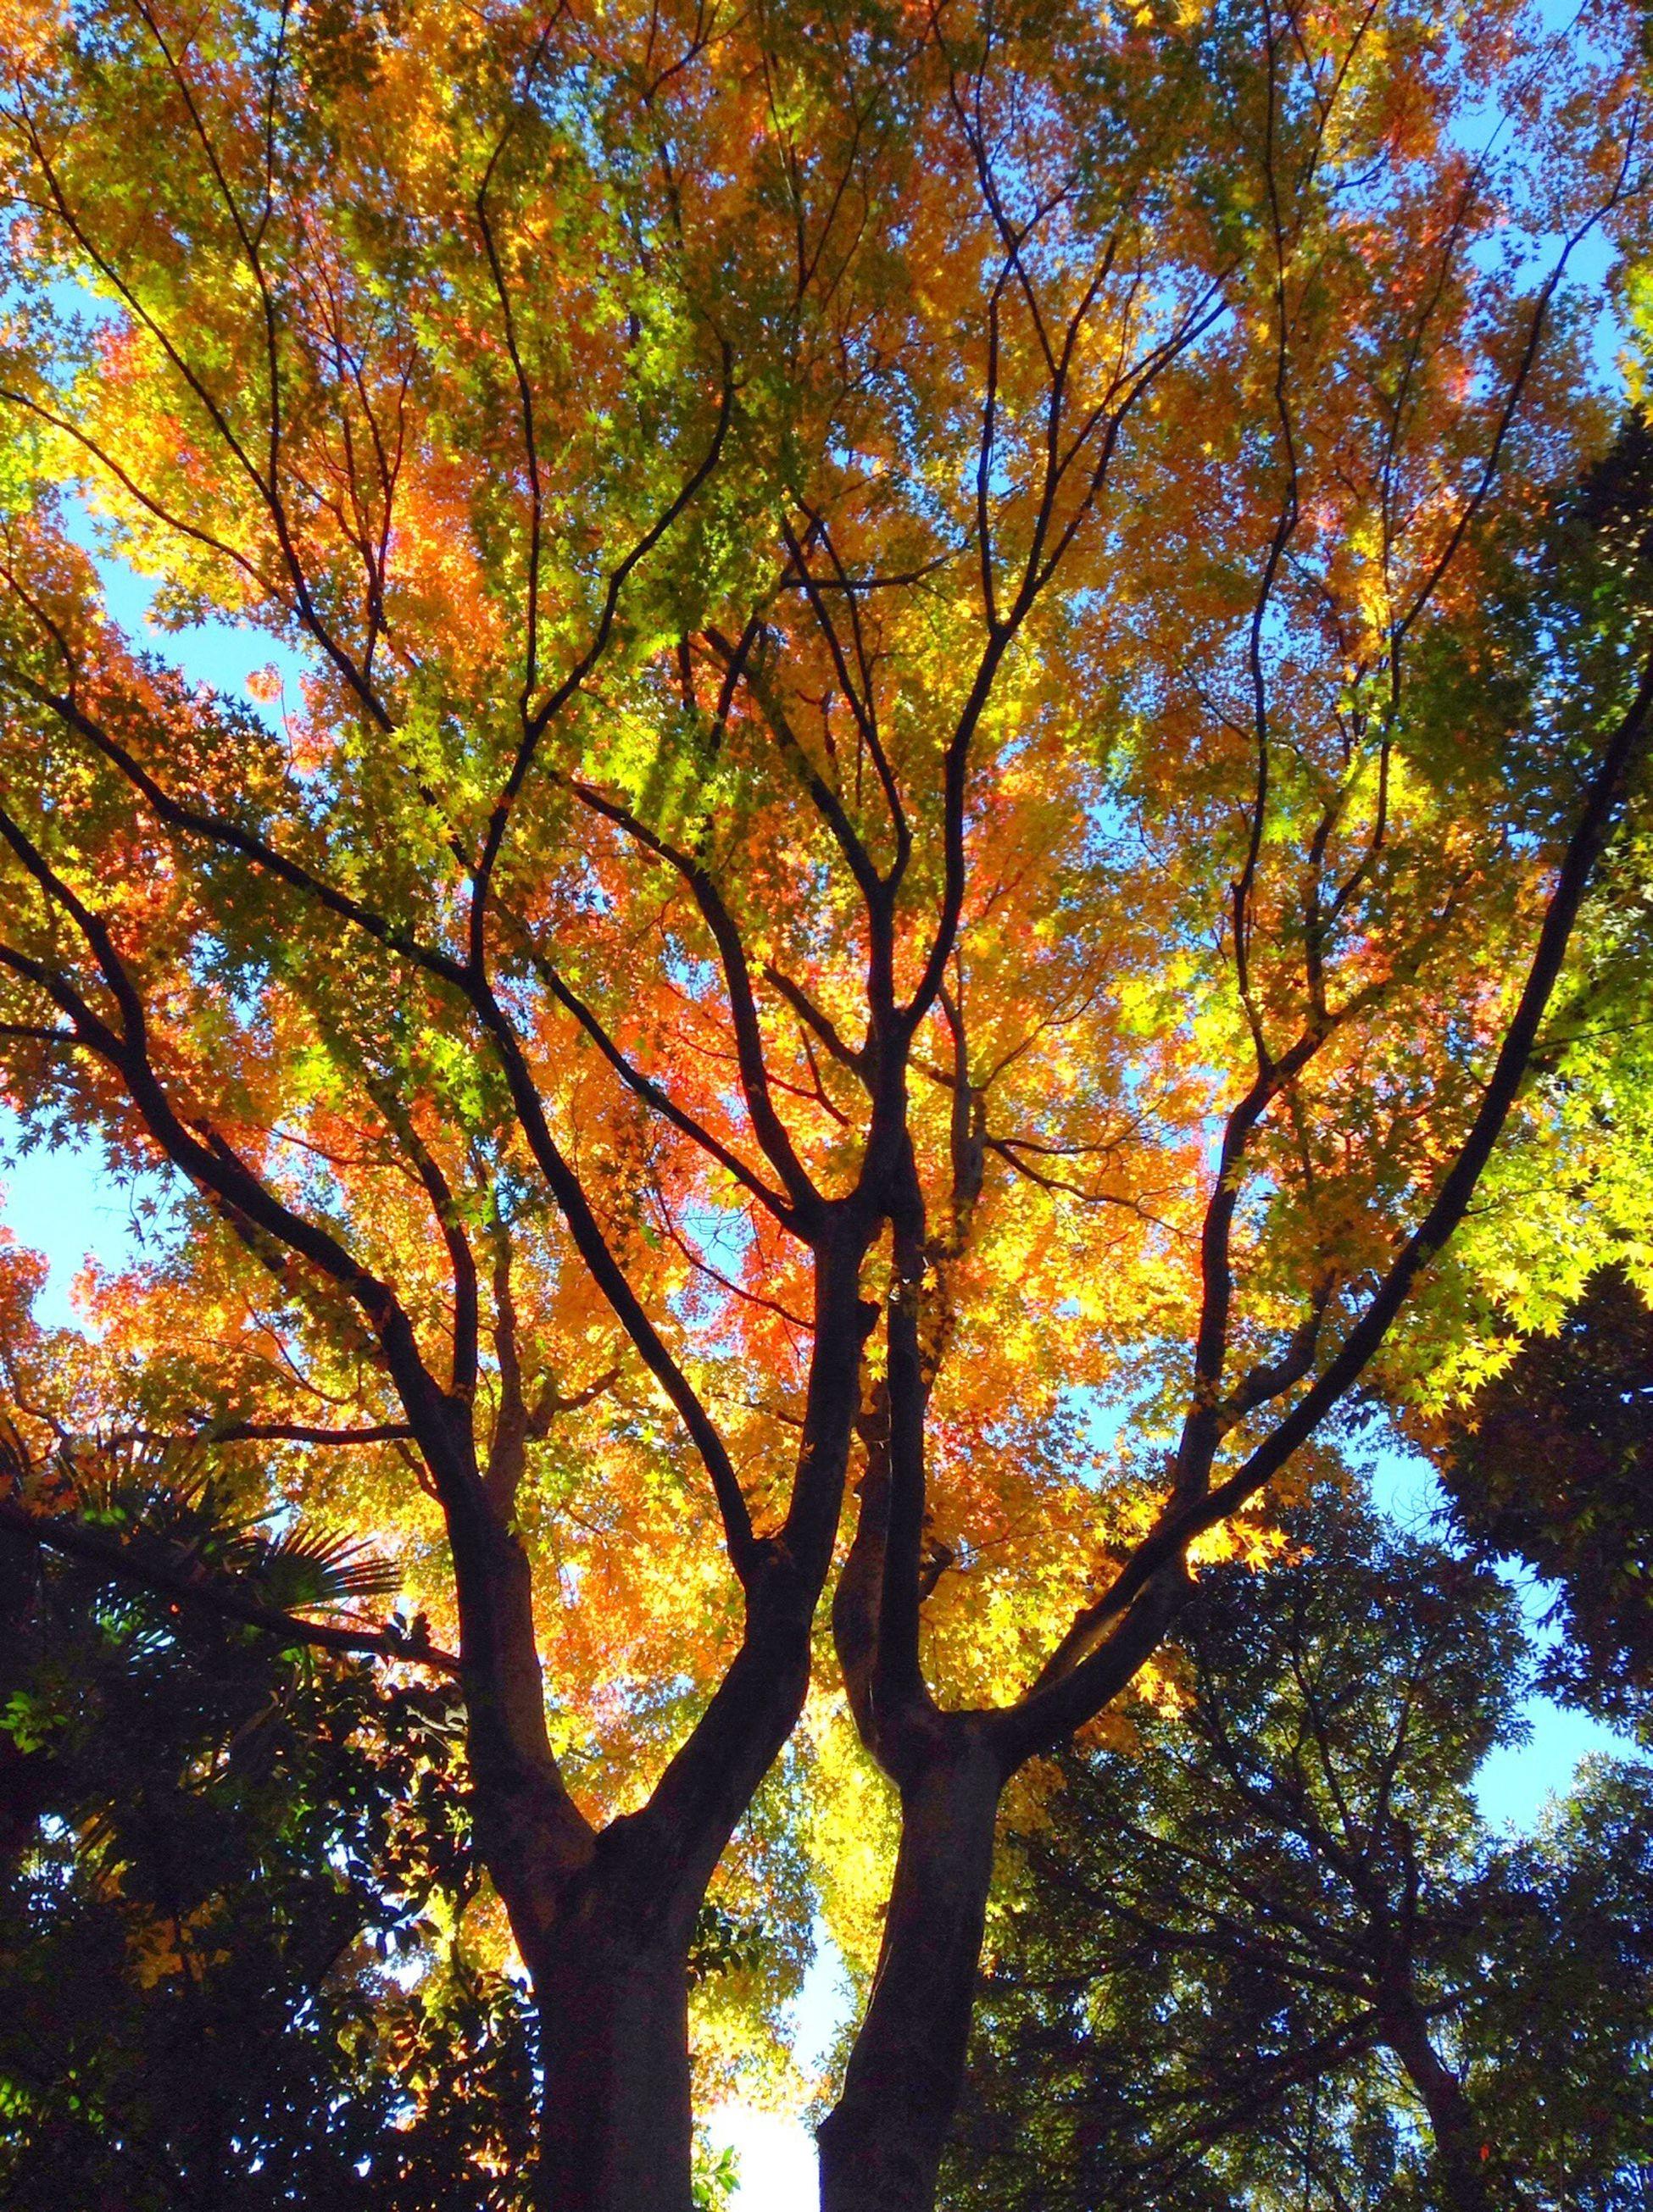 Trees TreePorn Autumn Autumn Colors Relaxing shirokanedai Tokyo Japan (屮゚∀゚)屮